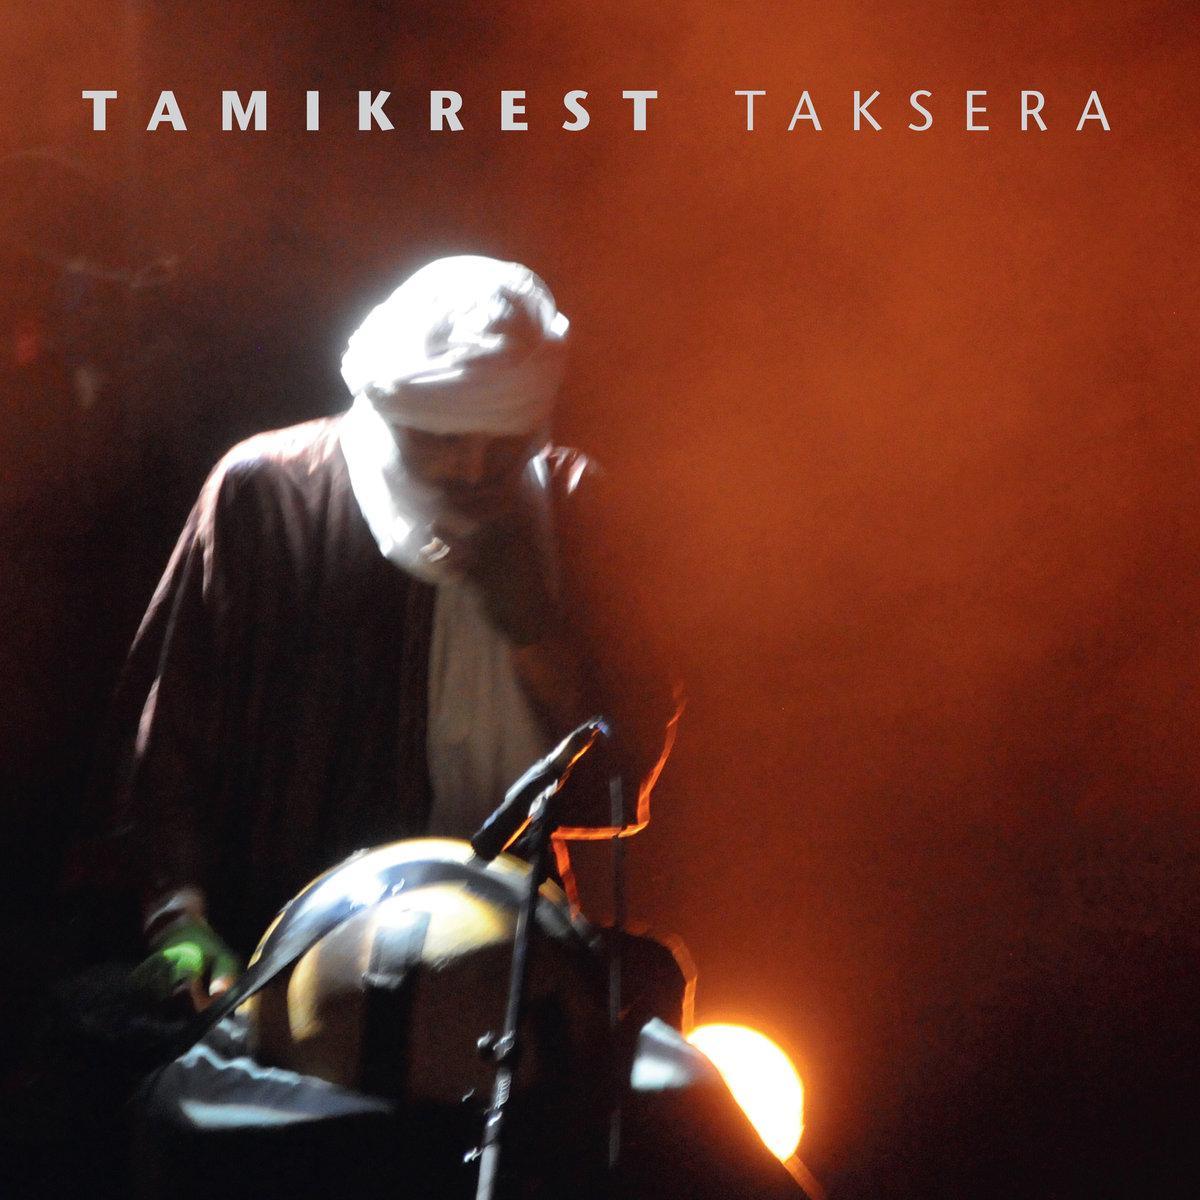 Image result for taksera tamikrest